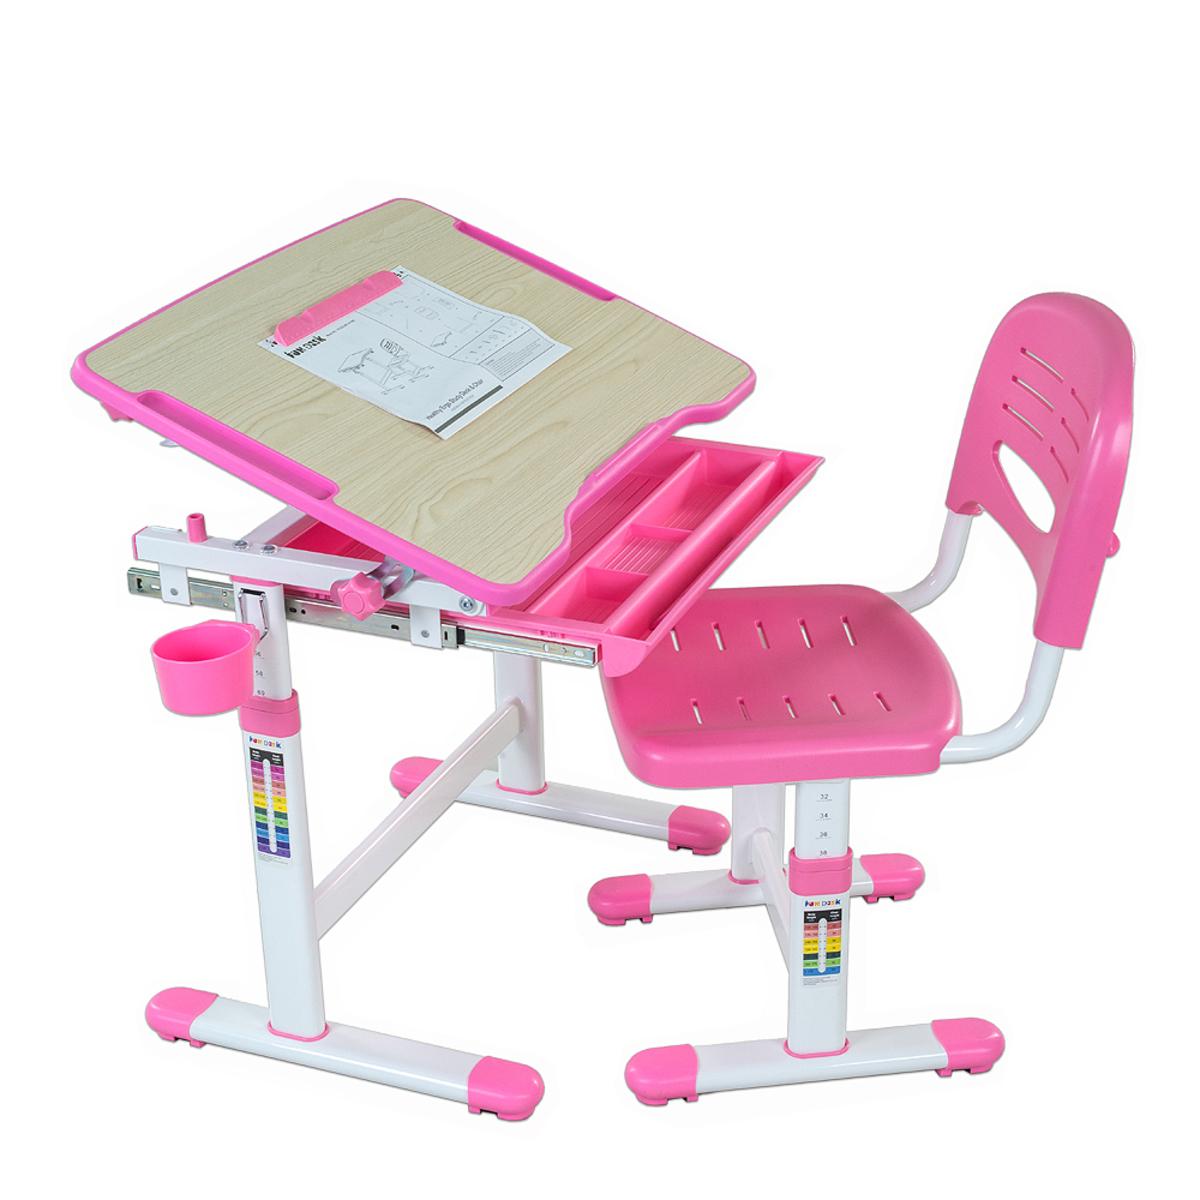 Detský písací stôl + stolička BAMBINO - rôzne farby ružová